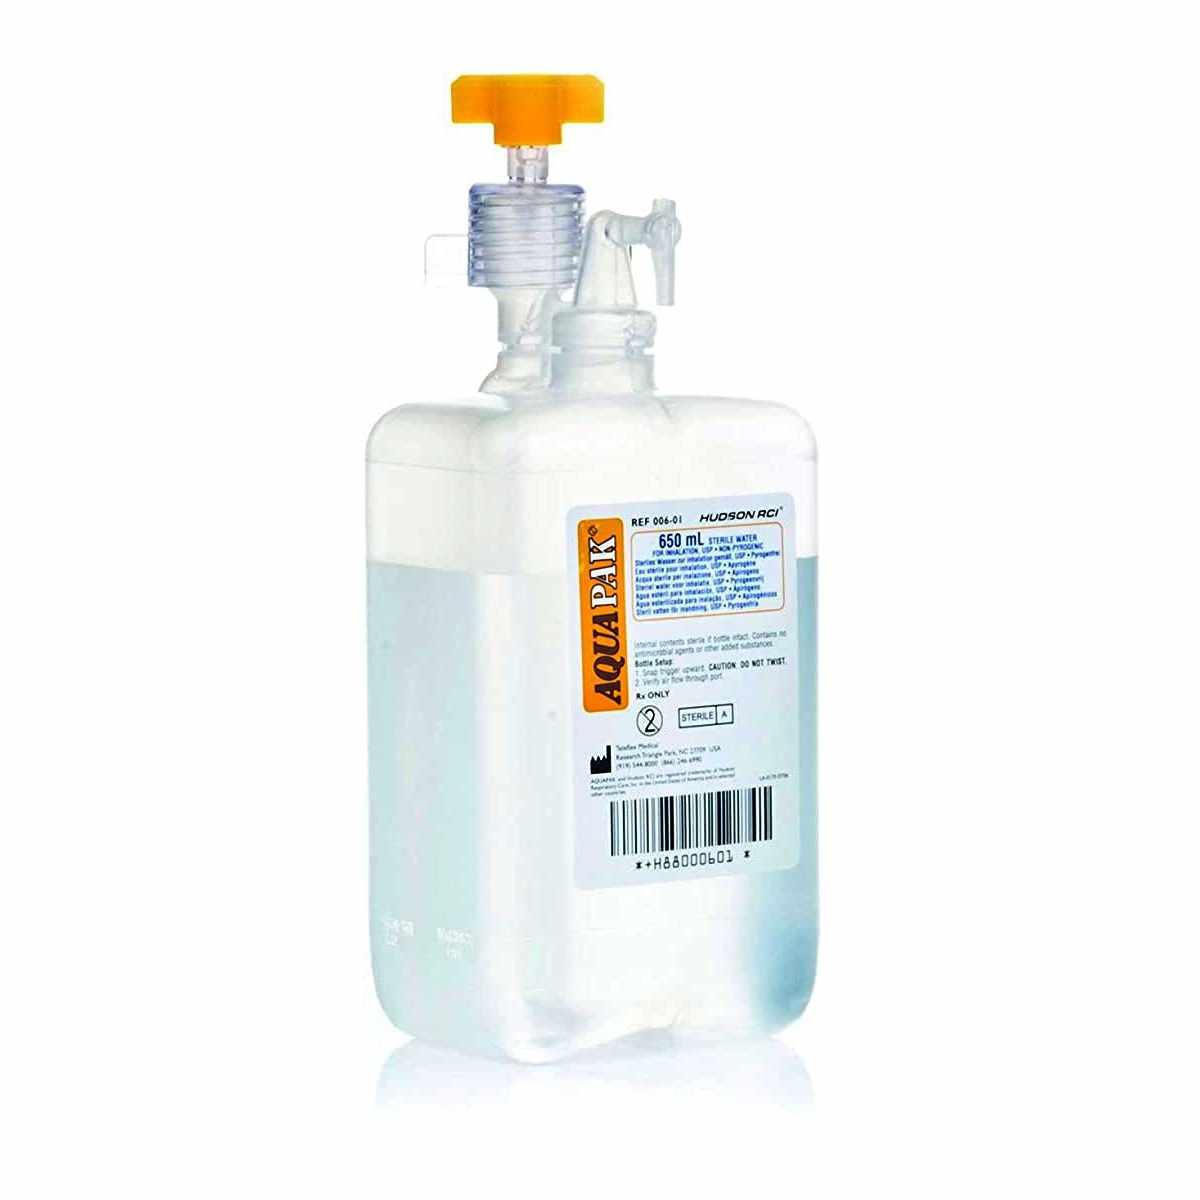 Teleflex Aquapak Prefilled Humidifier, 650ml Sterile Water, built-in oxygen tubing connectors